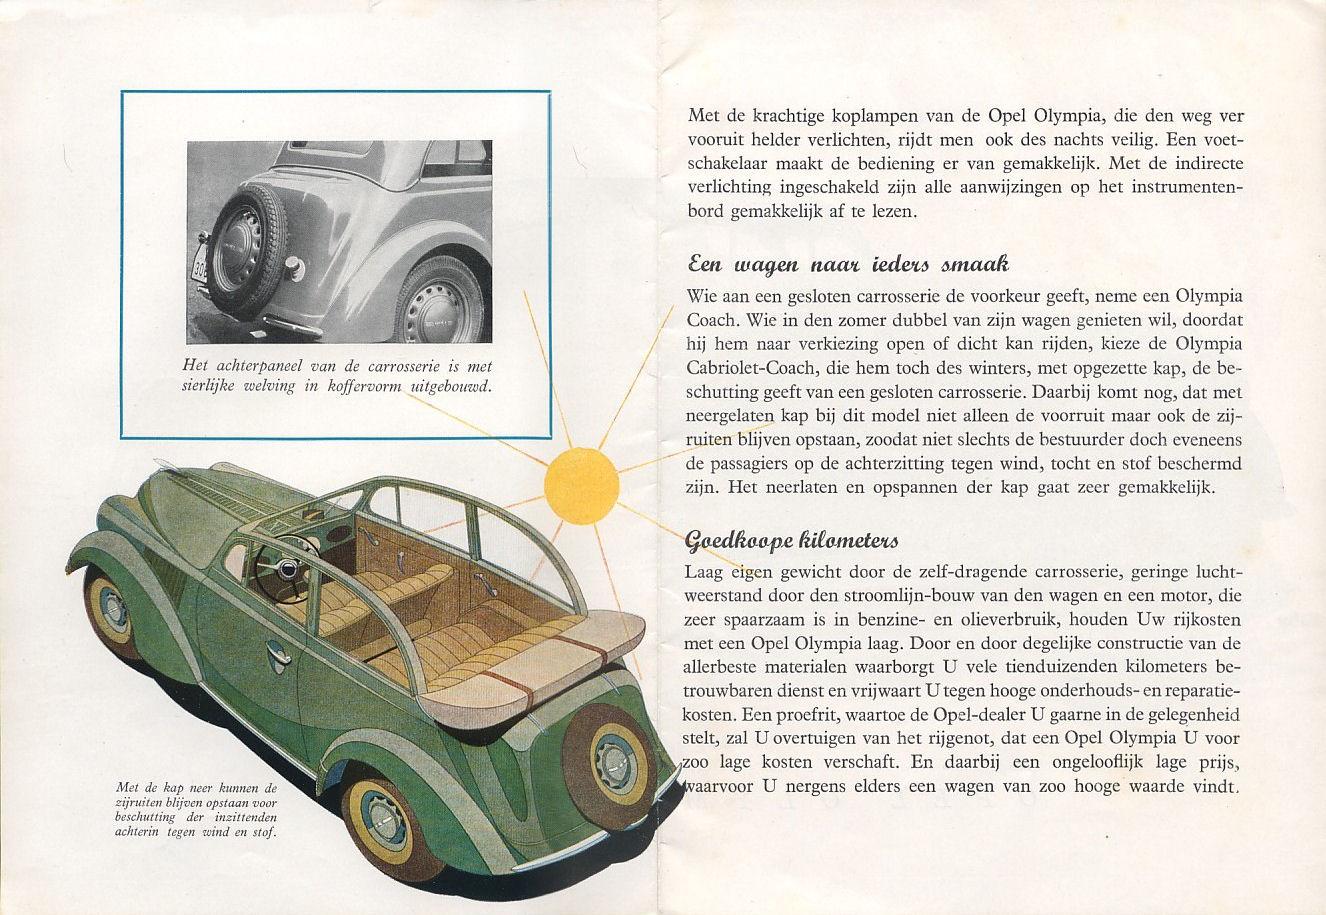 Opel Olympia Mod.1937 now